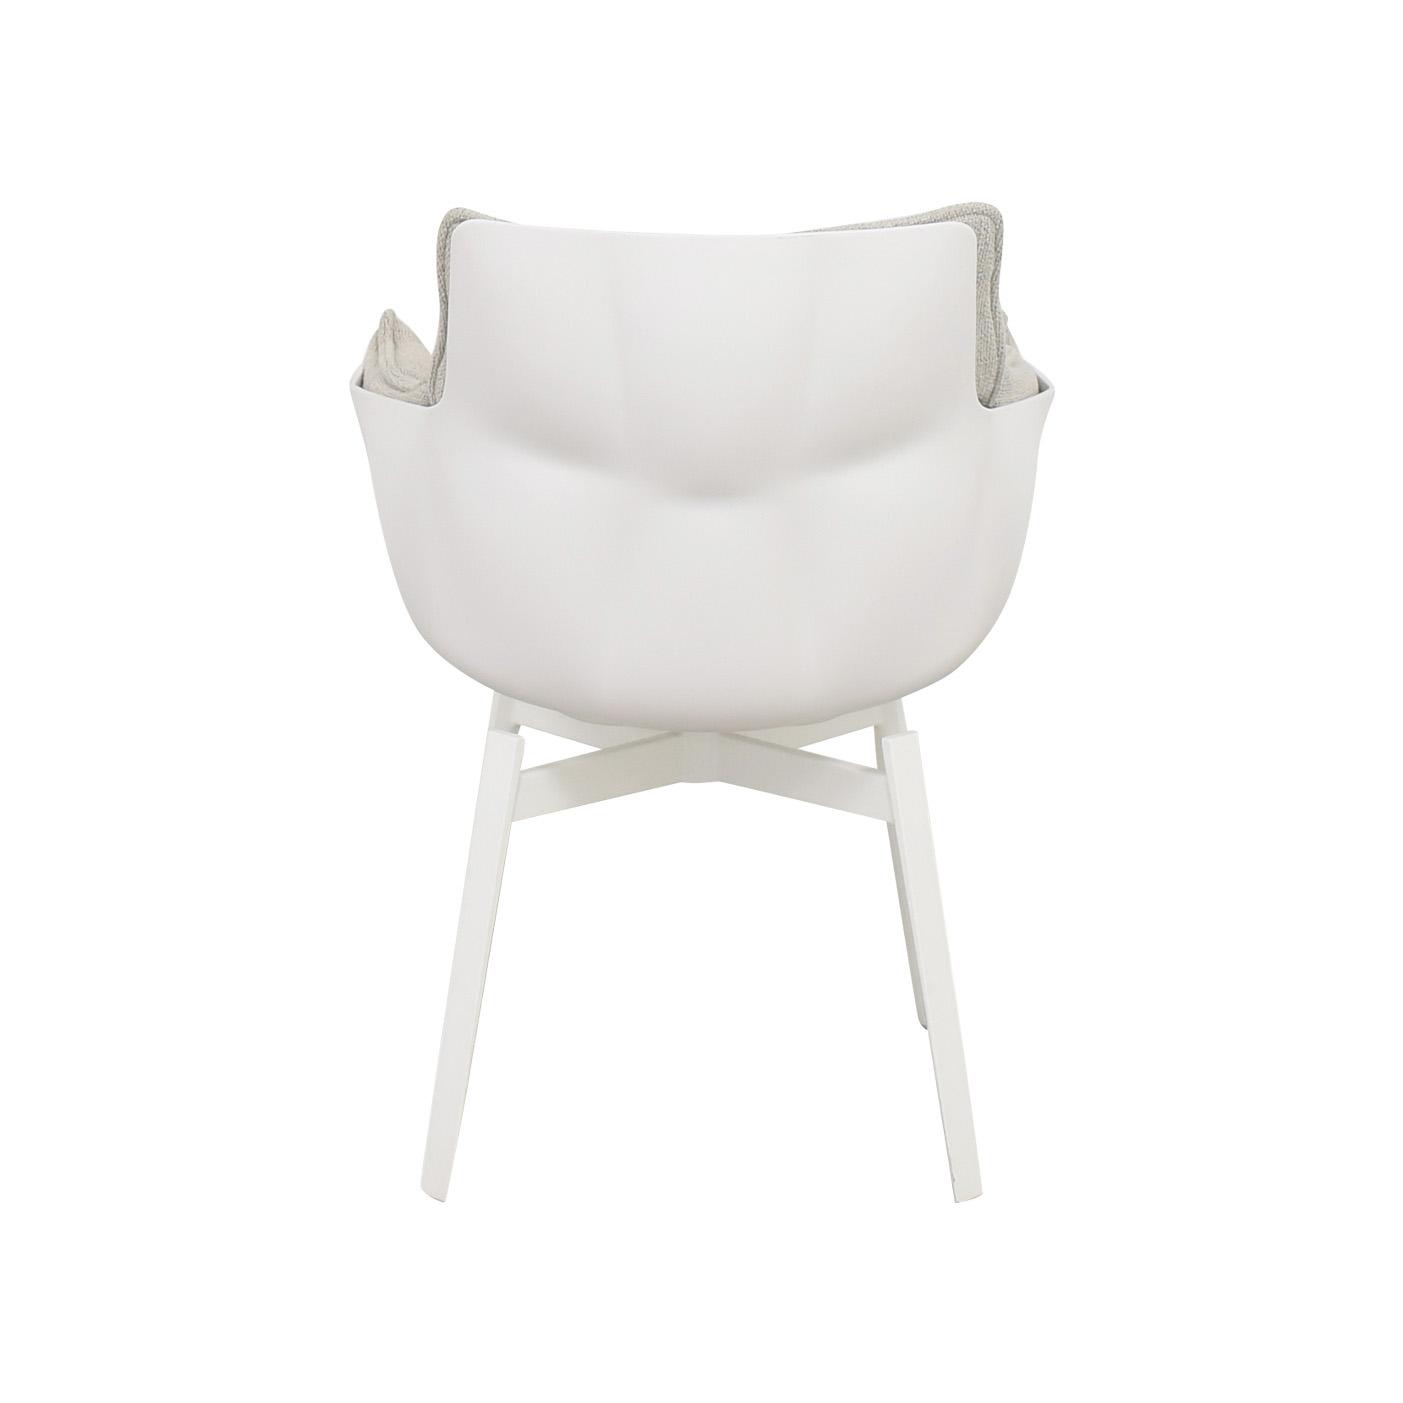 B&B Italia B&B Italia Husk Chair for sale